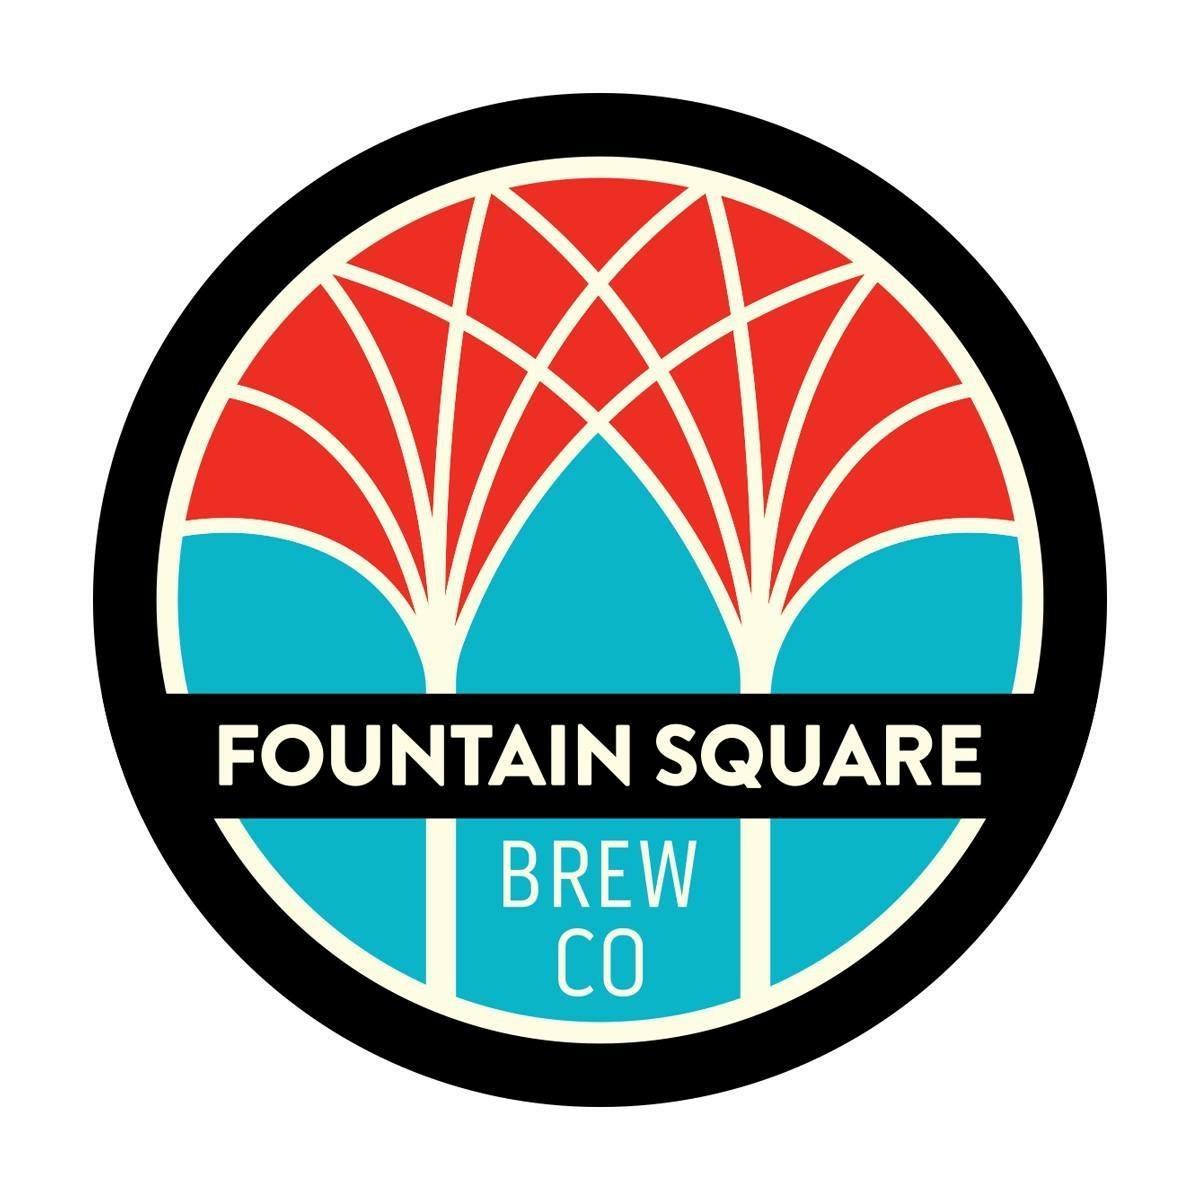 Fountain Square Brewing Company Graphic.jpg